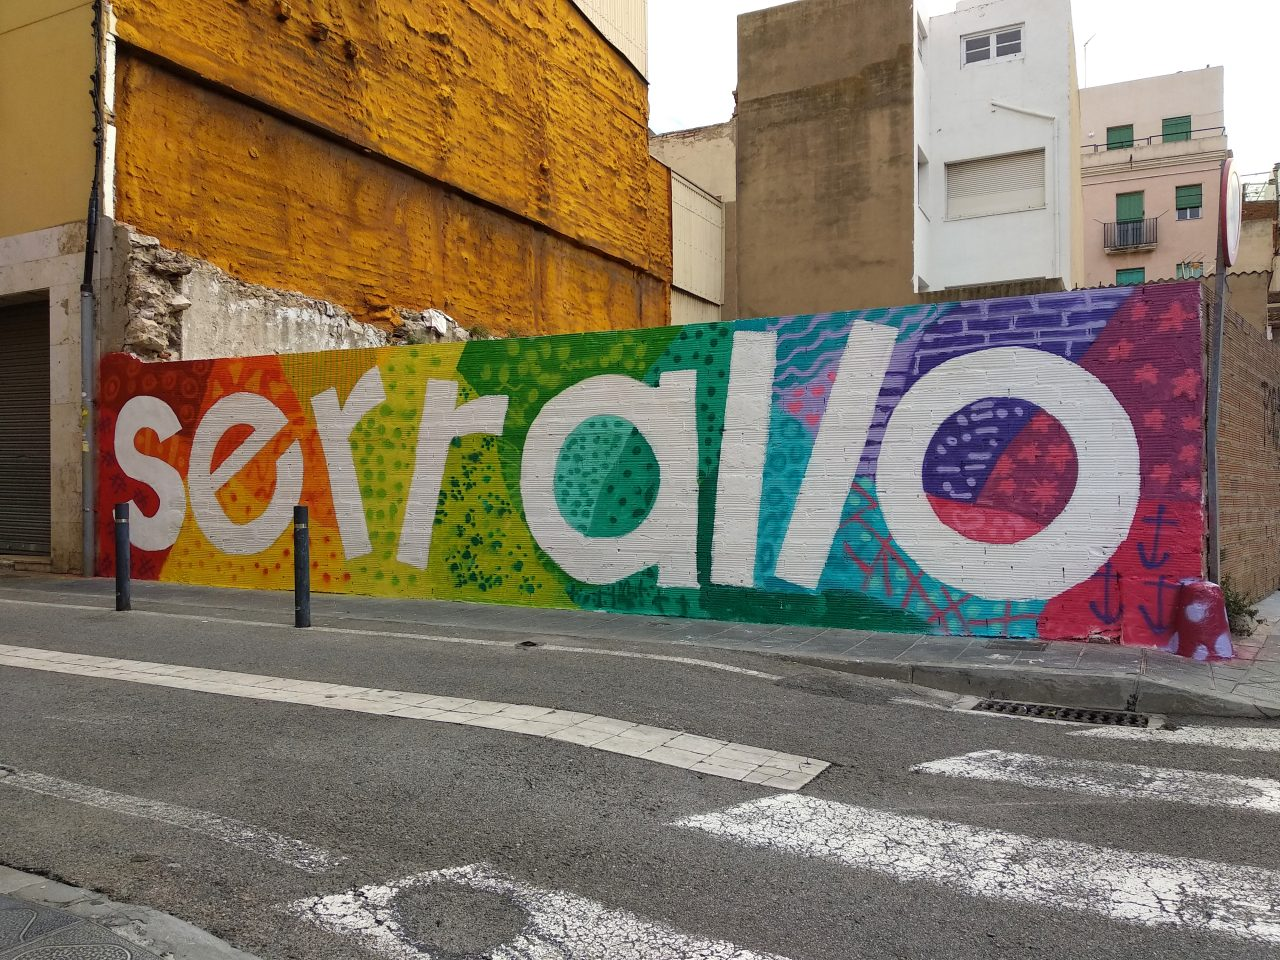 foto-serrallo-1280x960.jpg